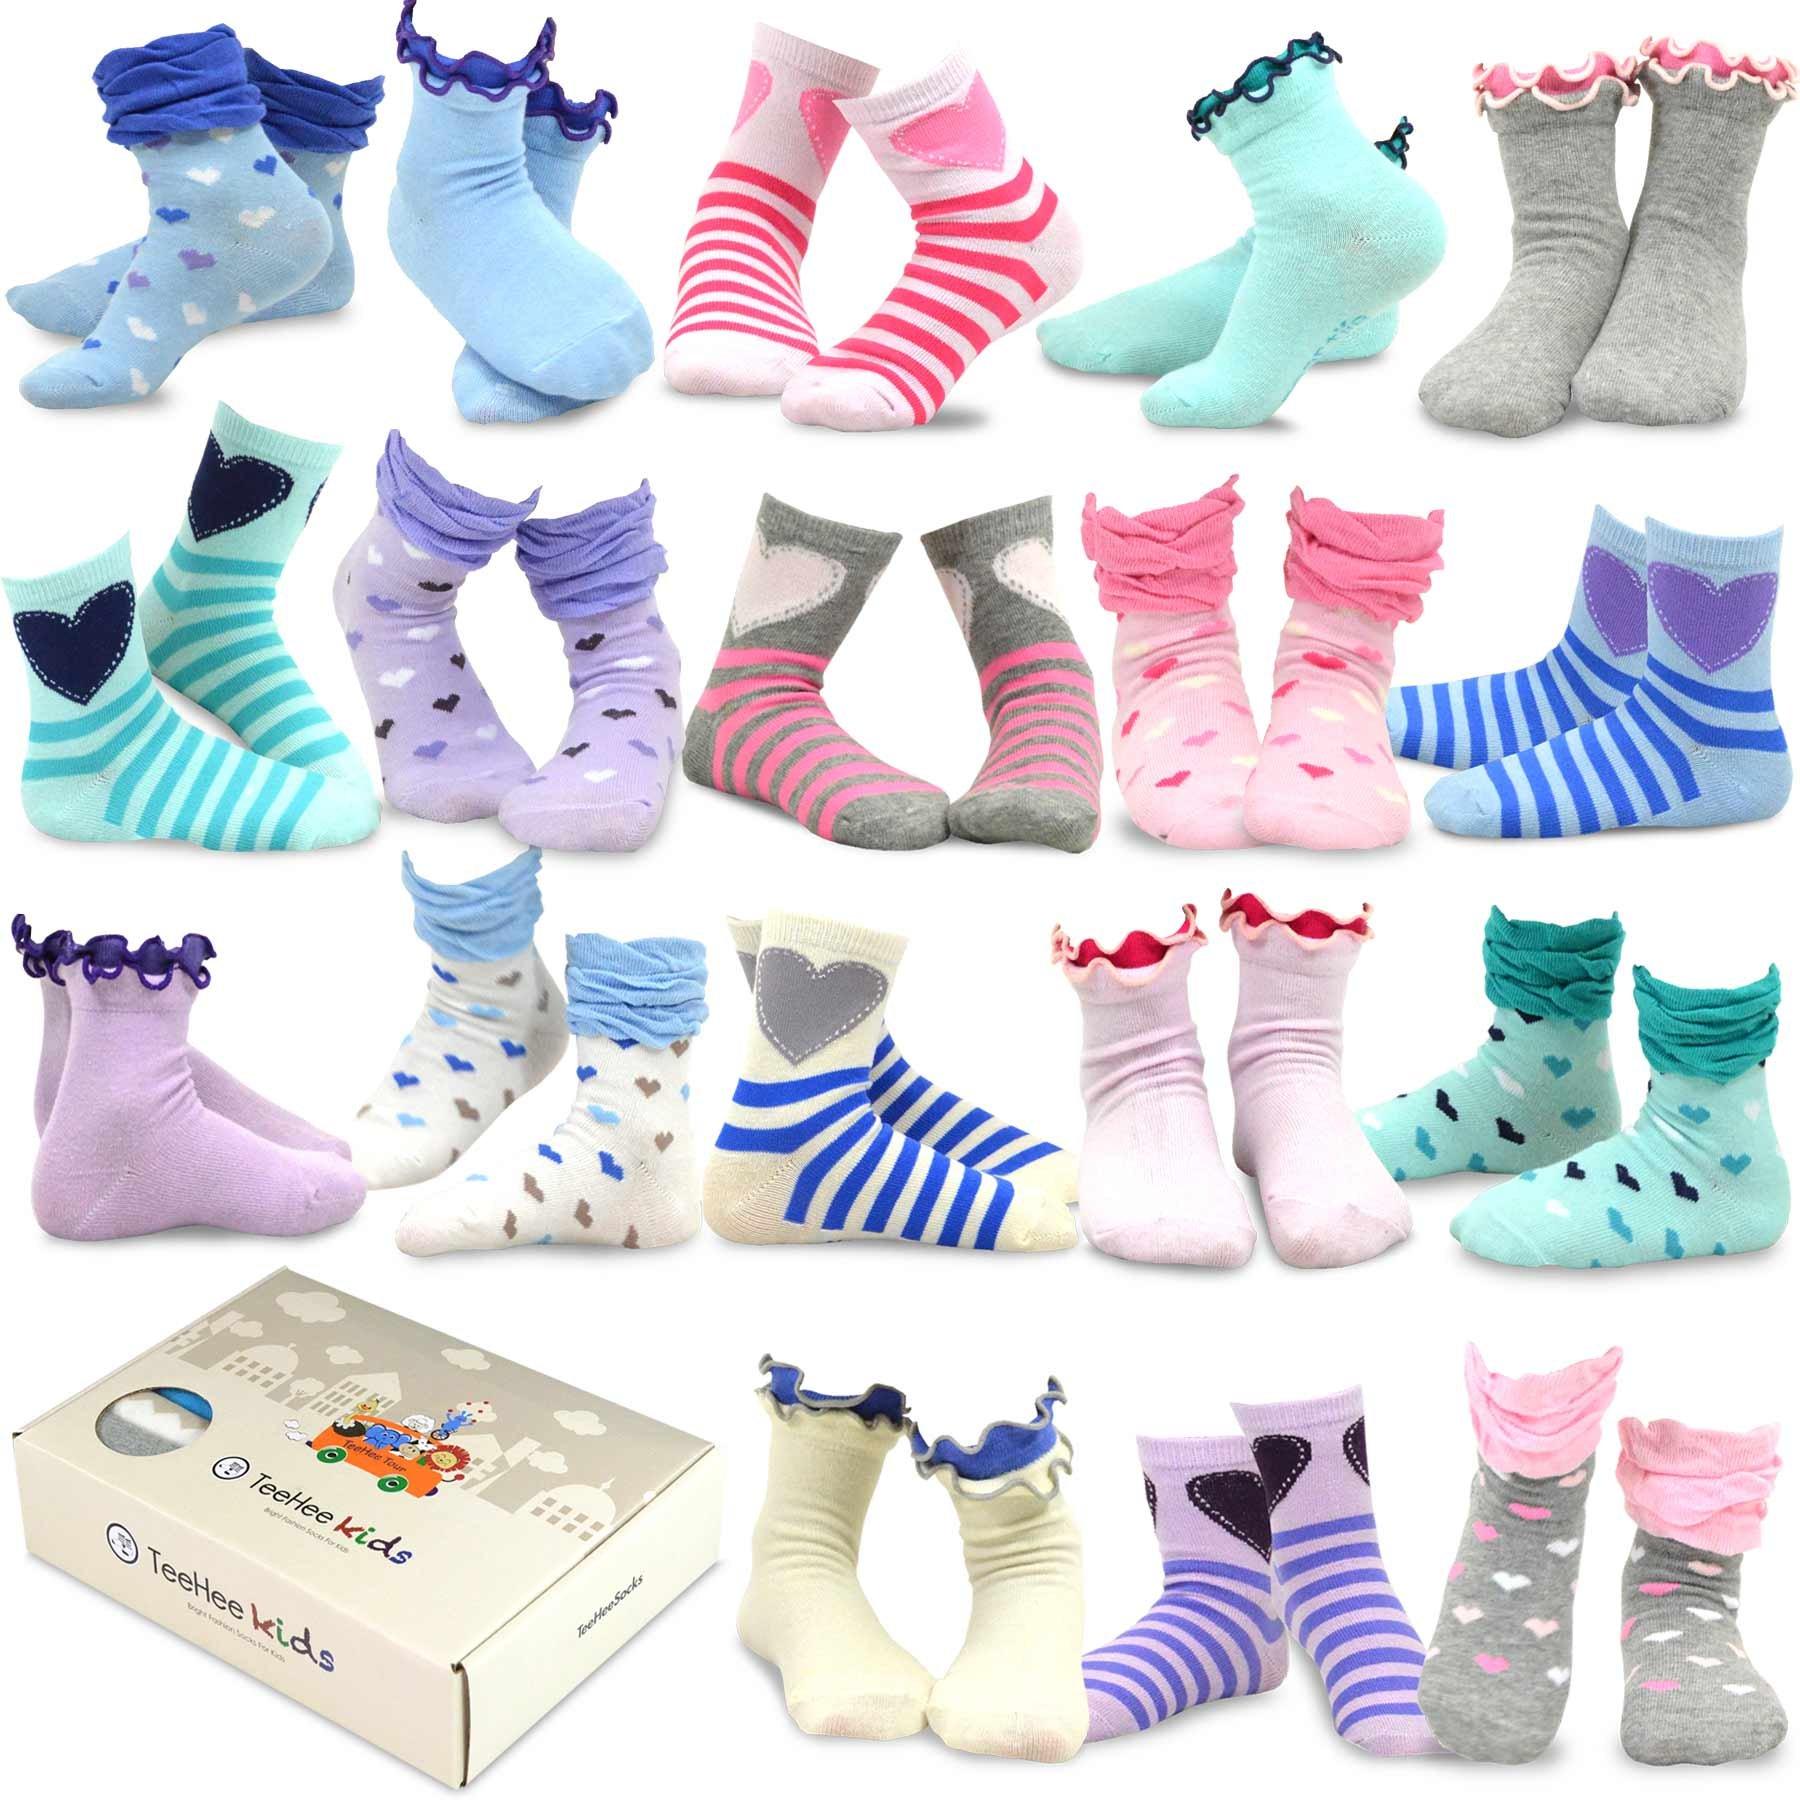 TeeHee (Naartjie) Kids Girls Fashion Variety Cotton Crew 18 Pair Pack Gift Box (6-8 Years, Hearts)